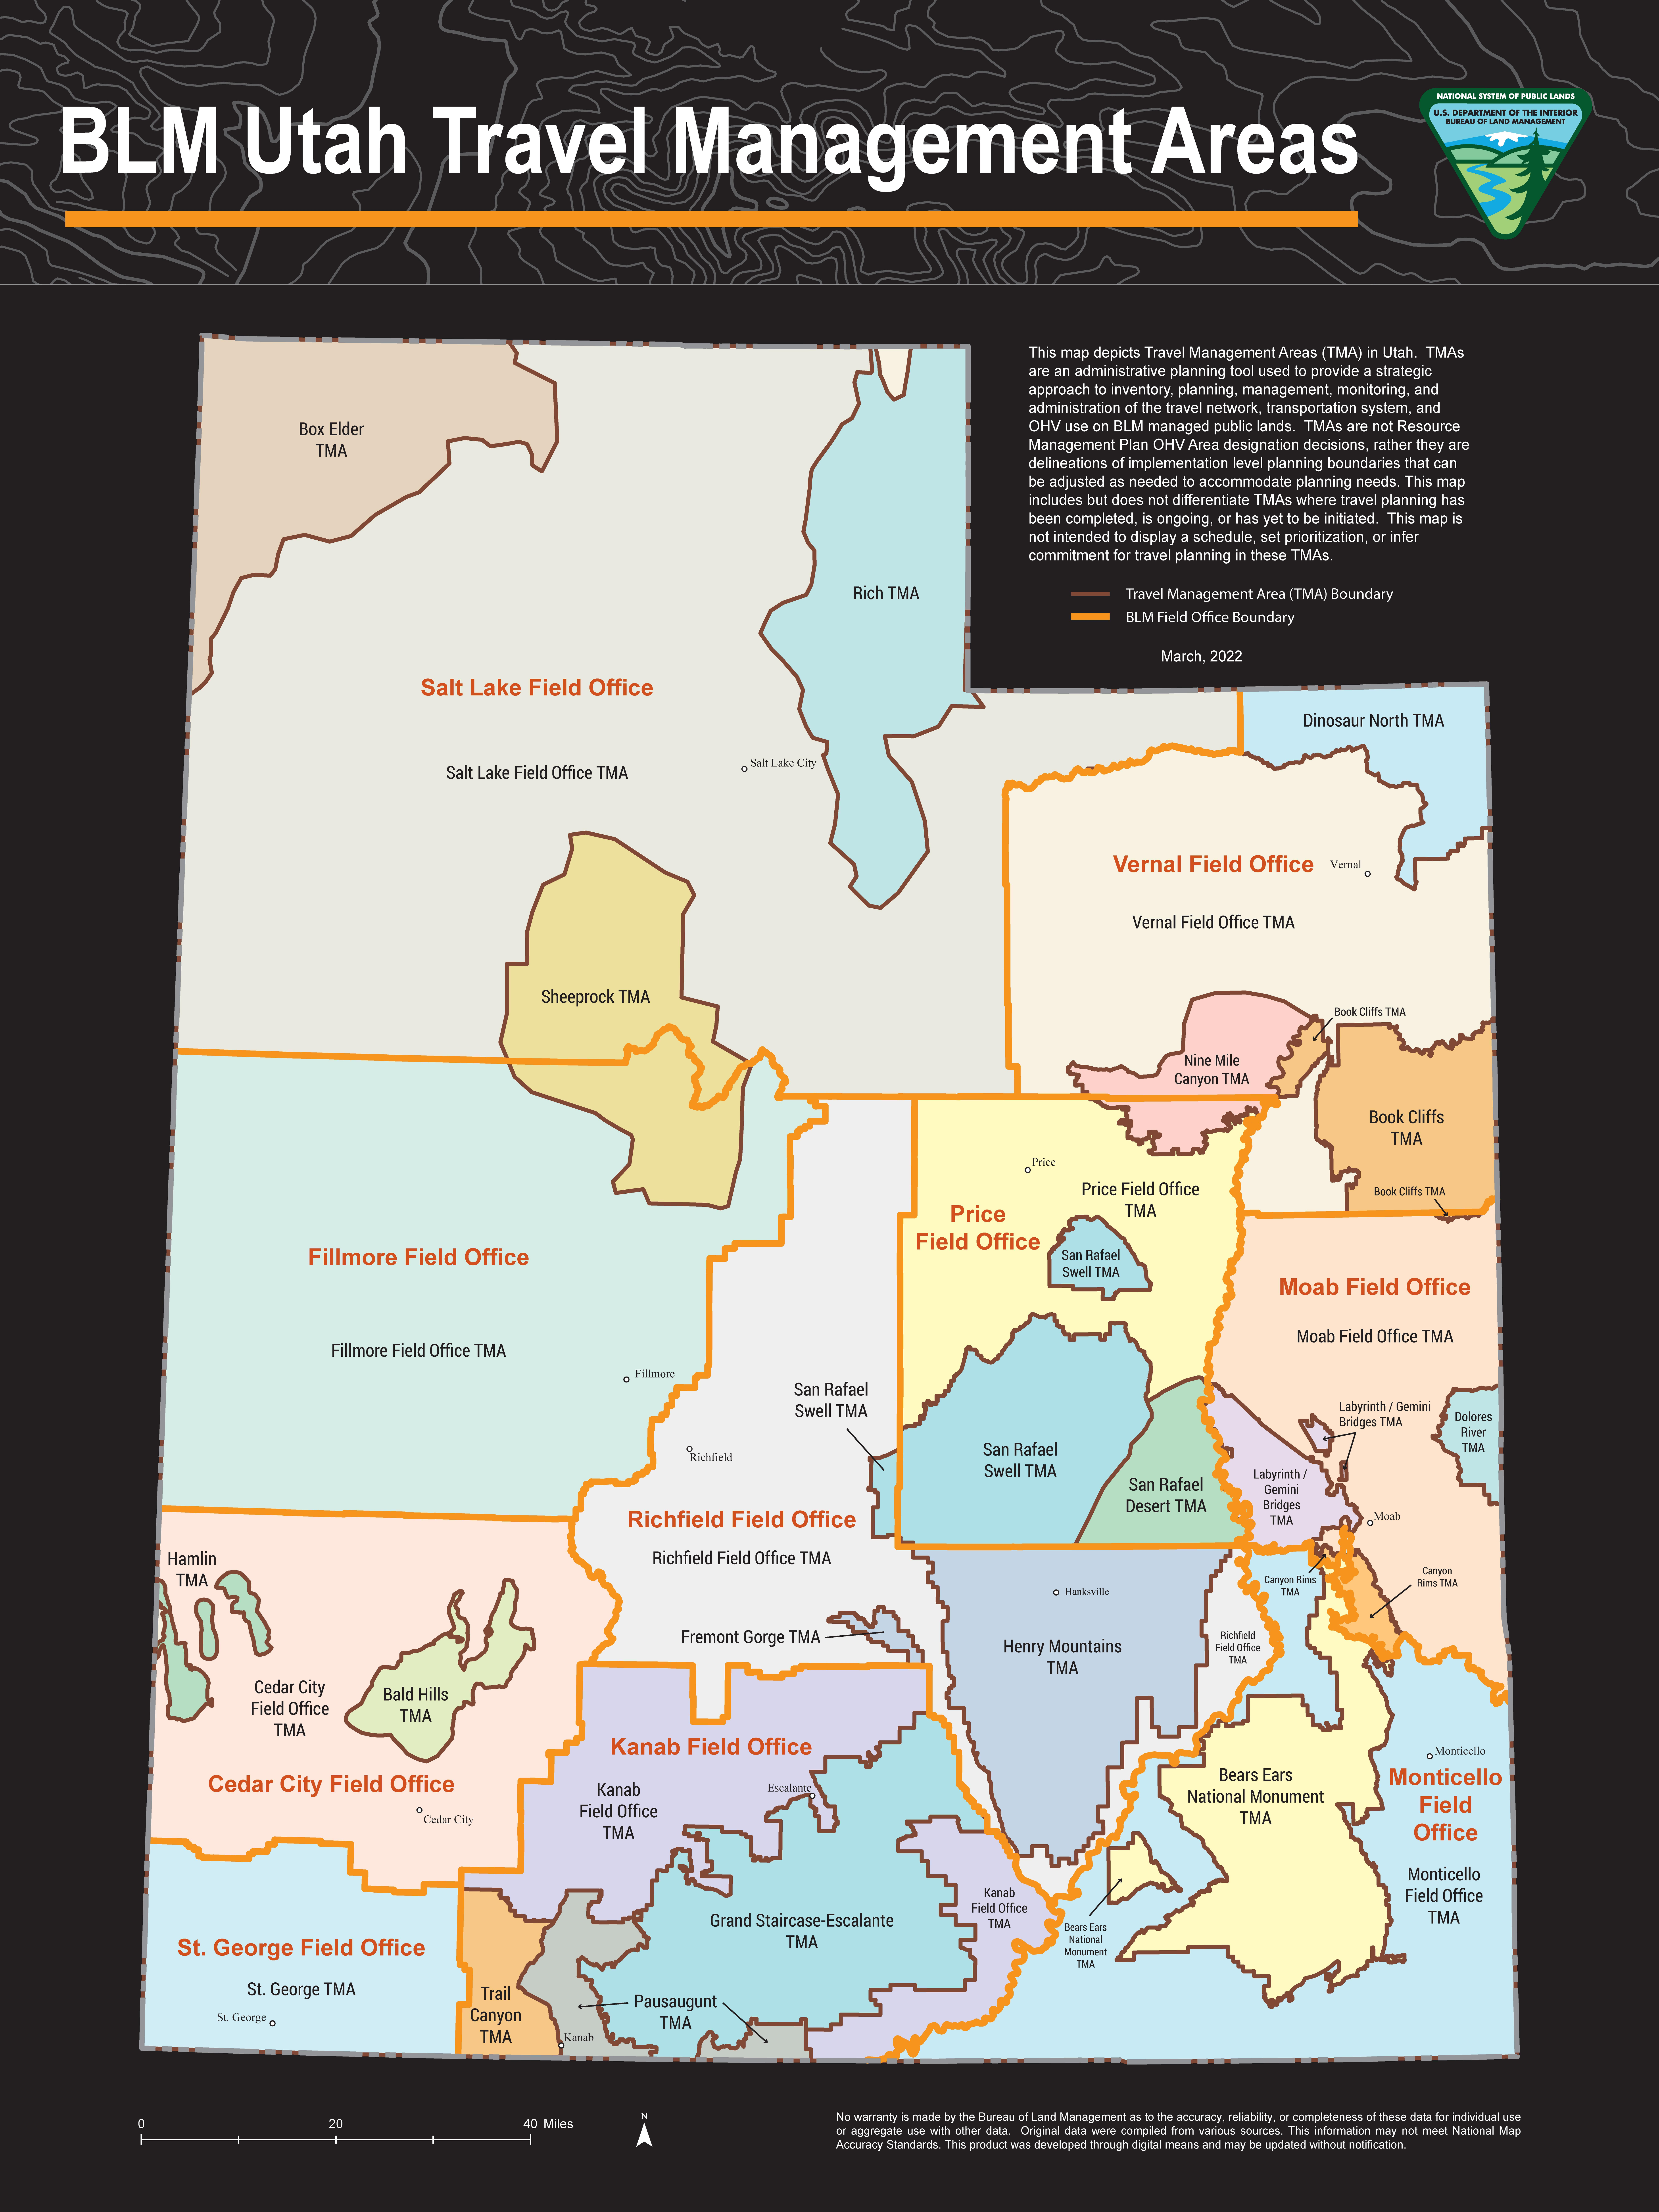 Utah - Travel and Transportation | Bureau of Land Management